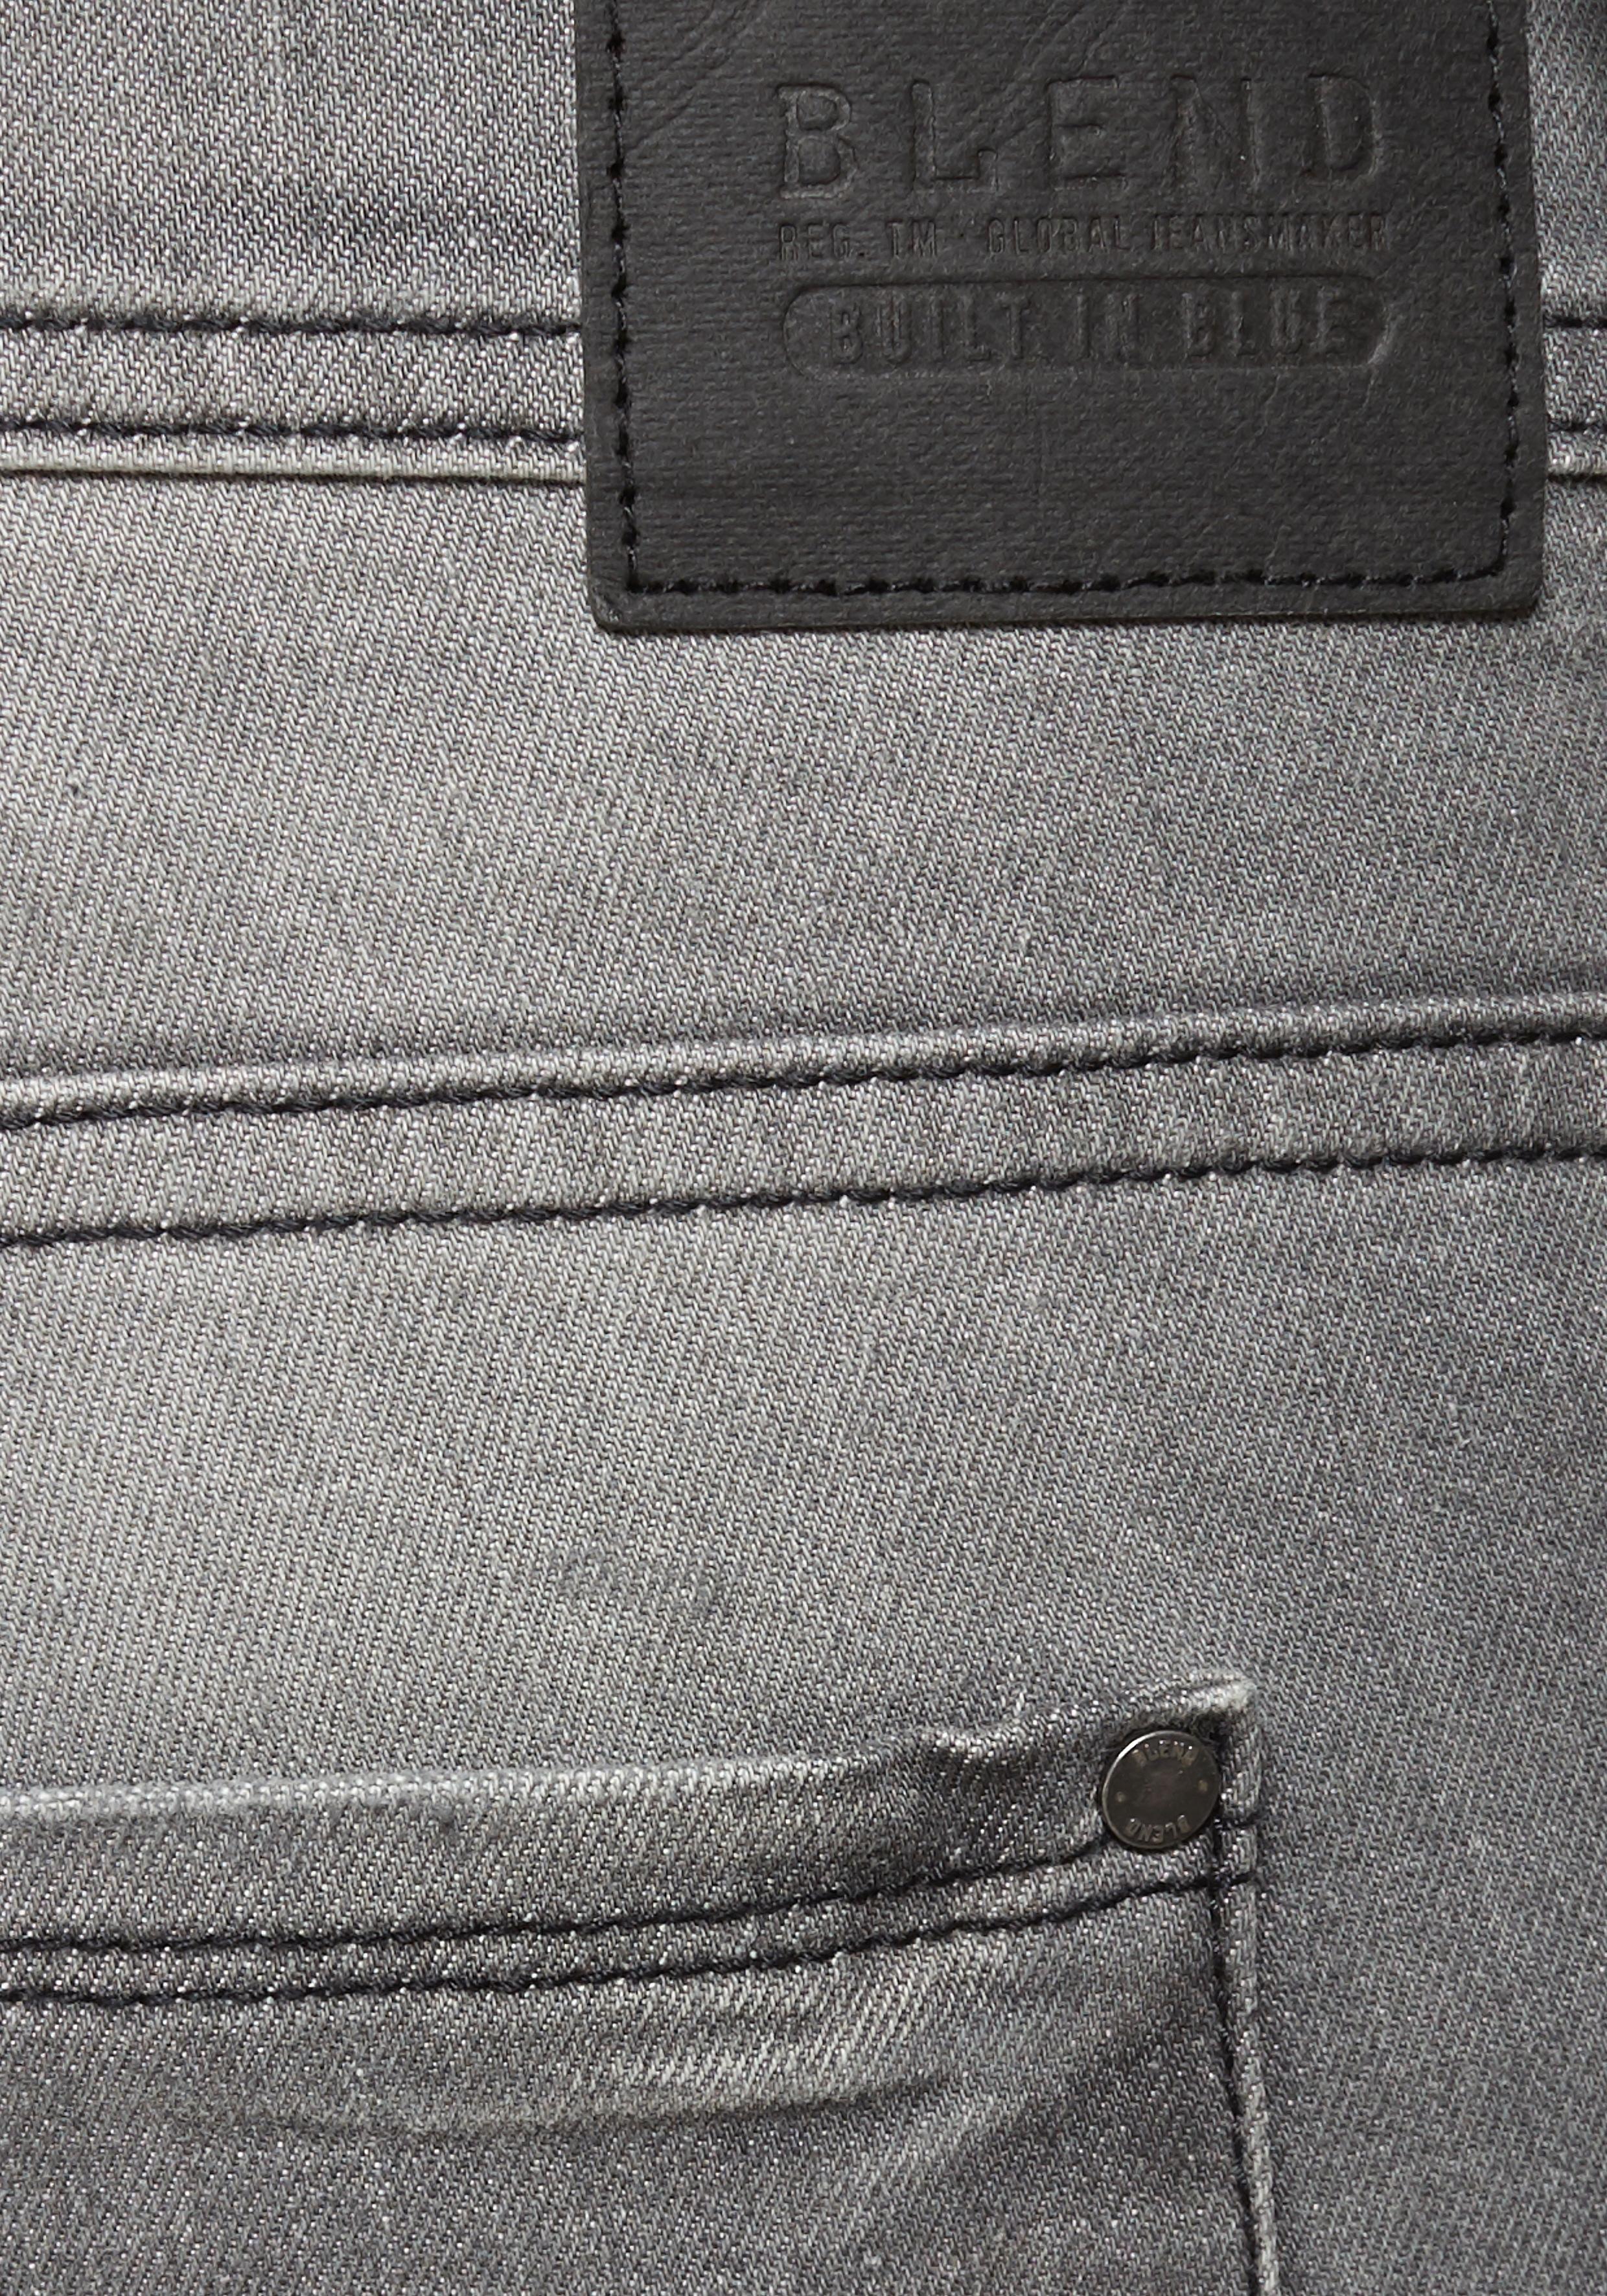 Blend Jeansbermudas Twister   Bekleidung > Shorts & Bermudas > Jeans Bermudas   Blend